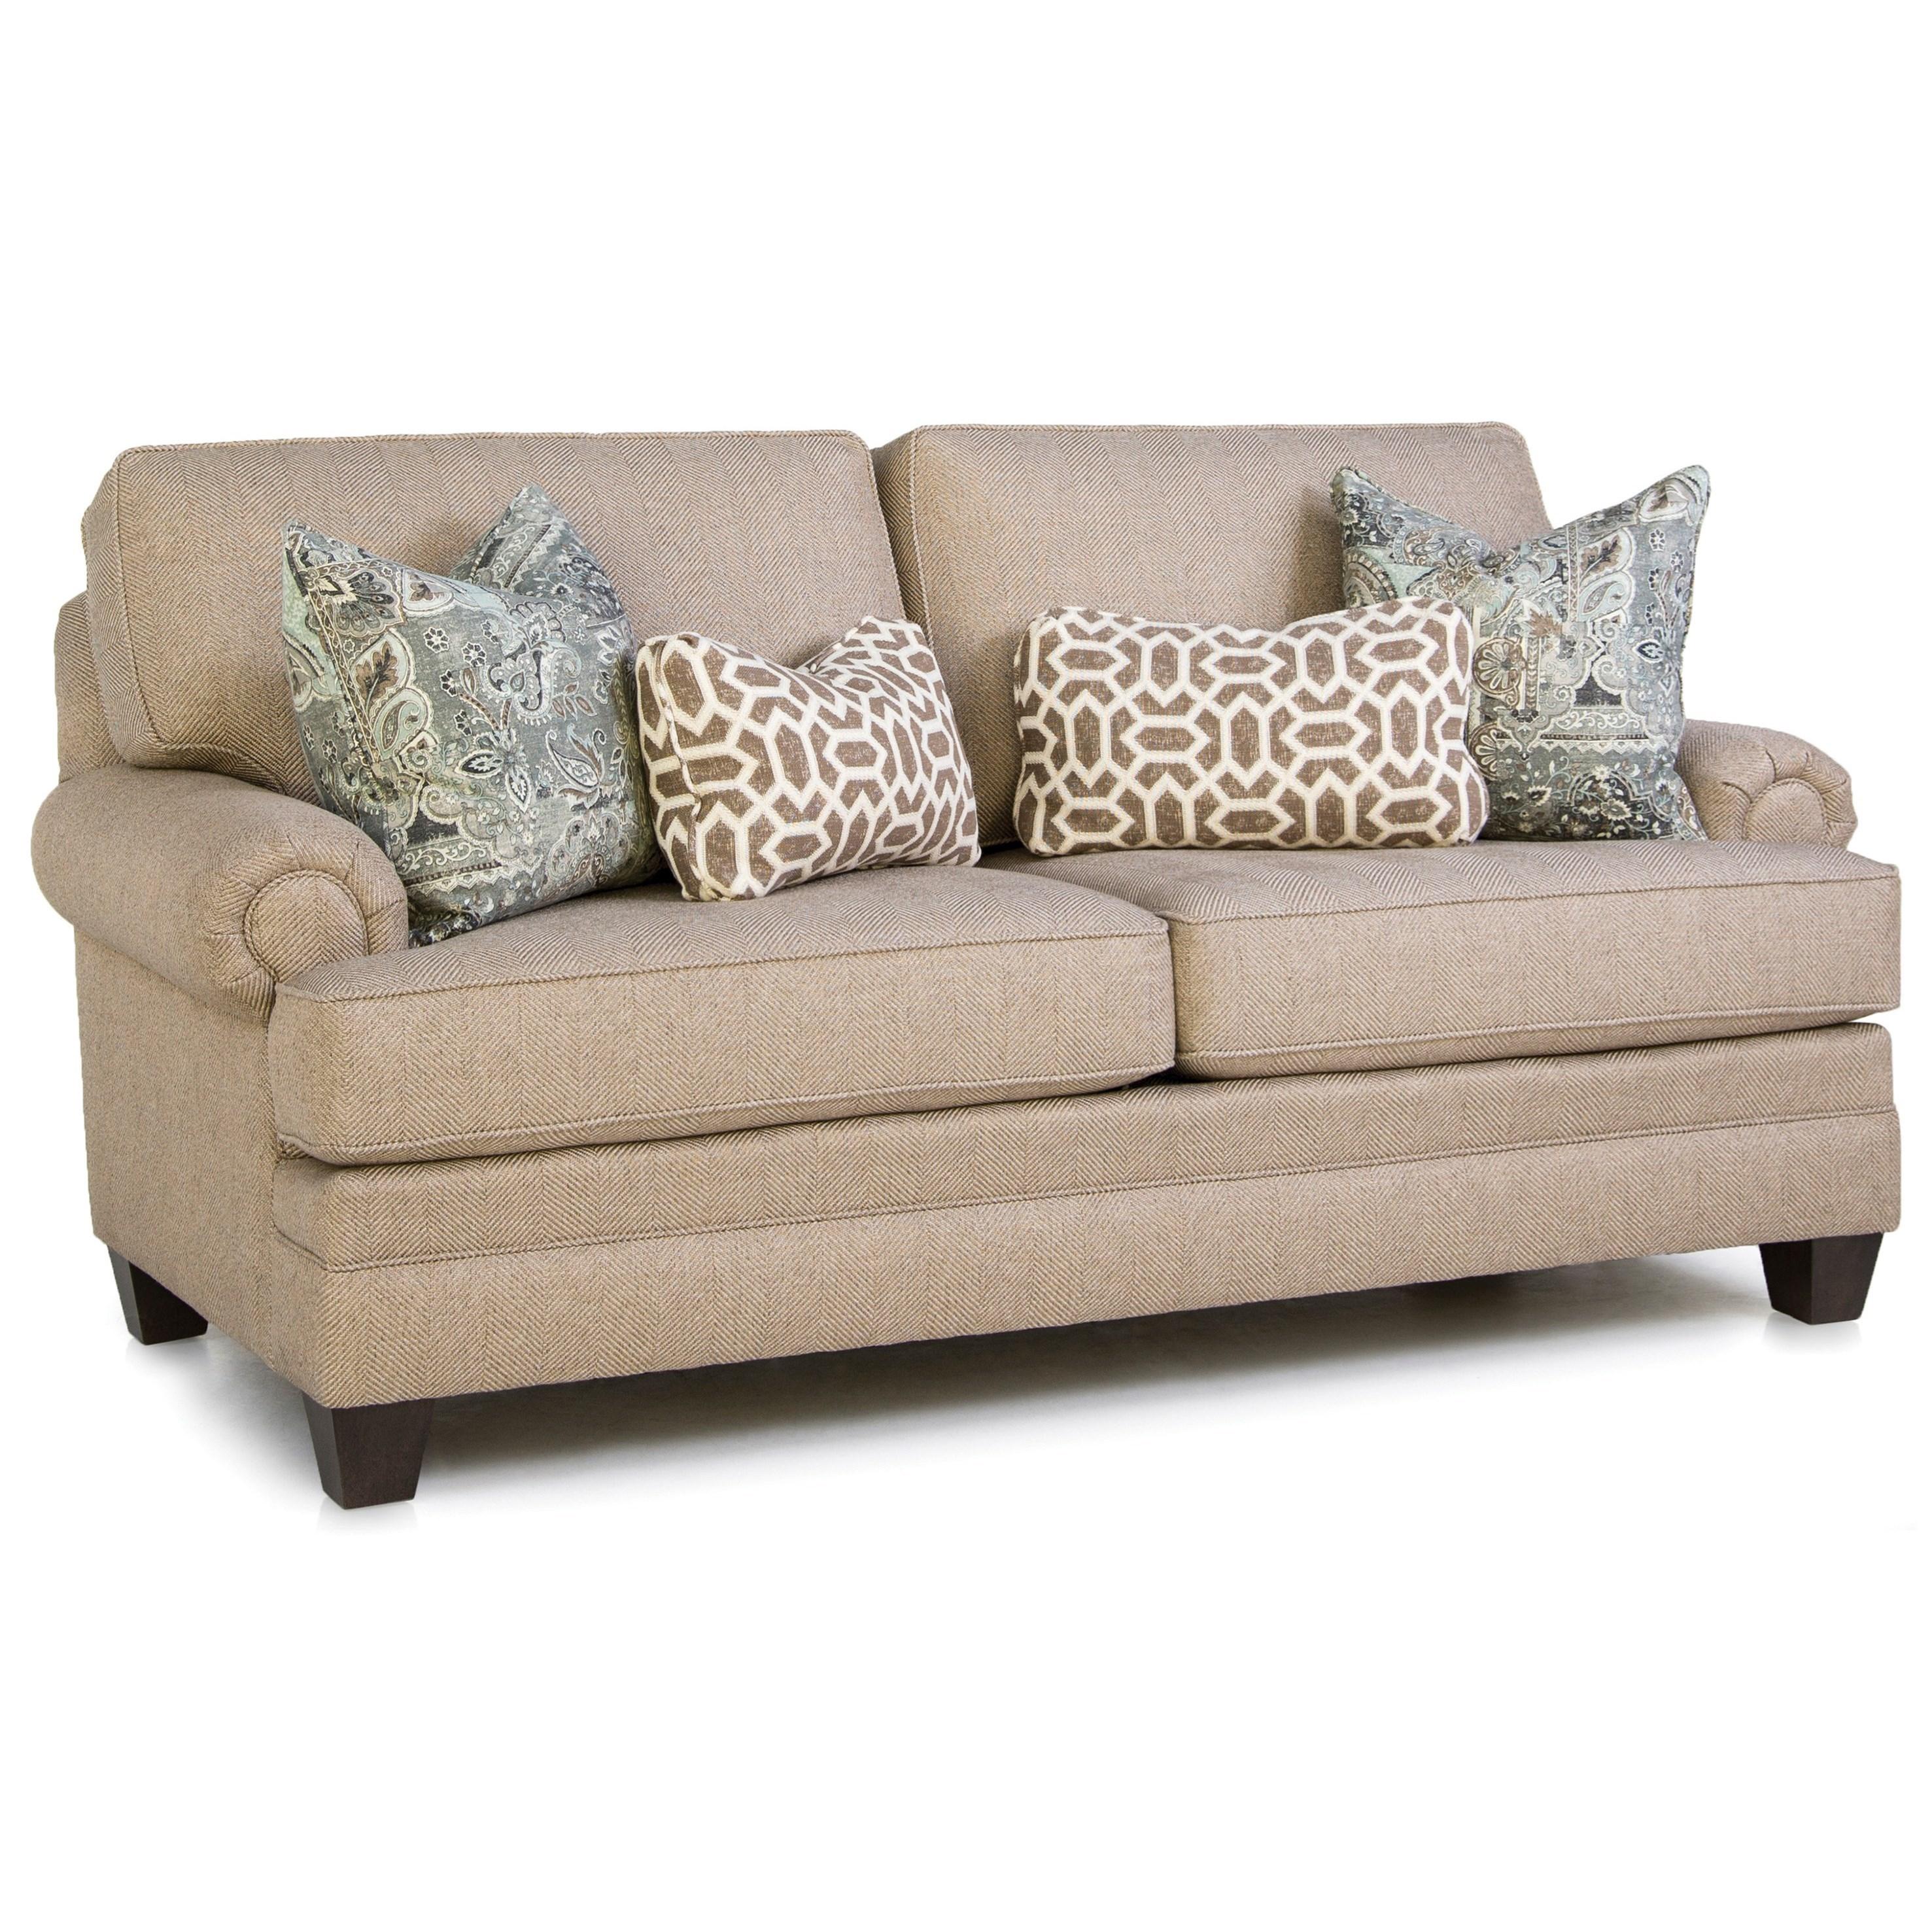 Customizable Mid-Size Sofa